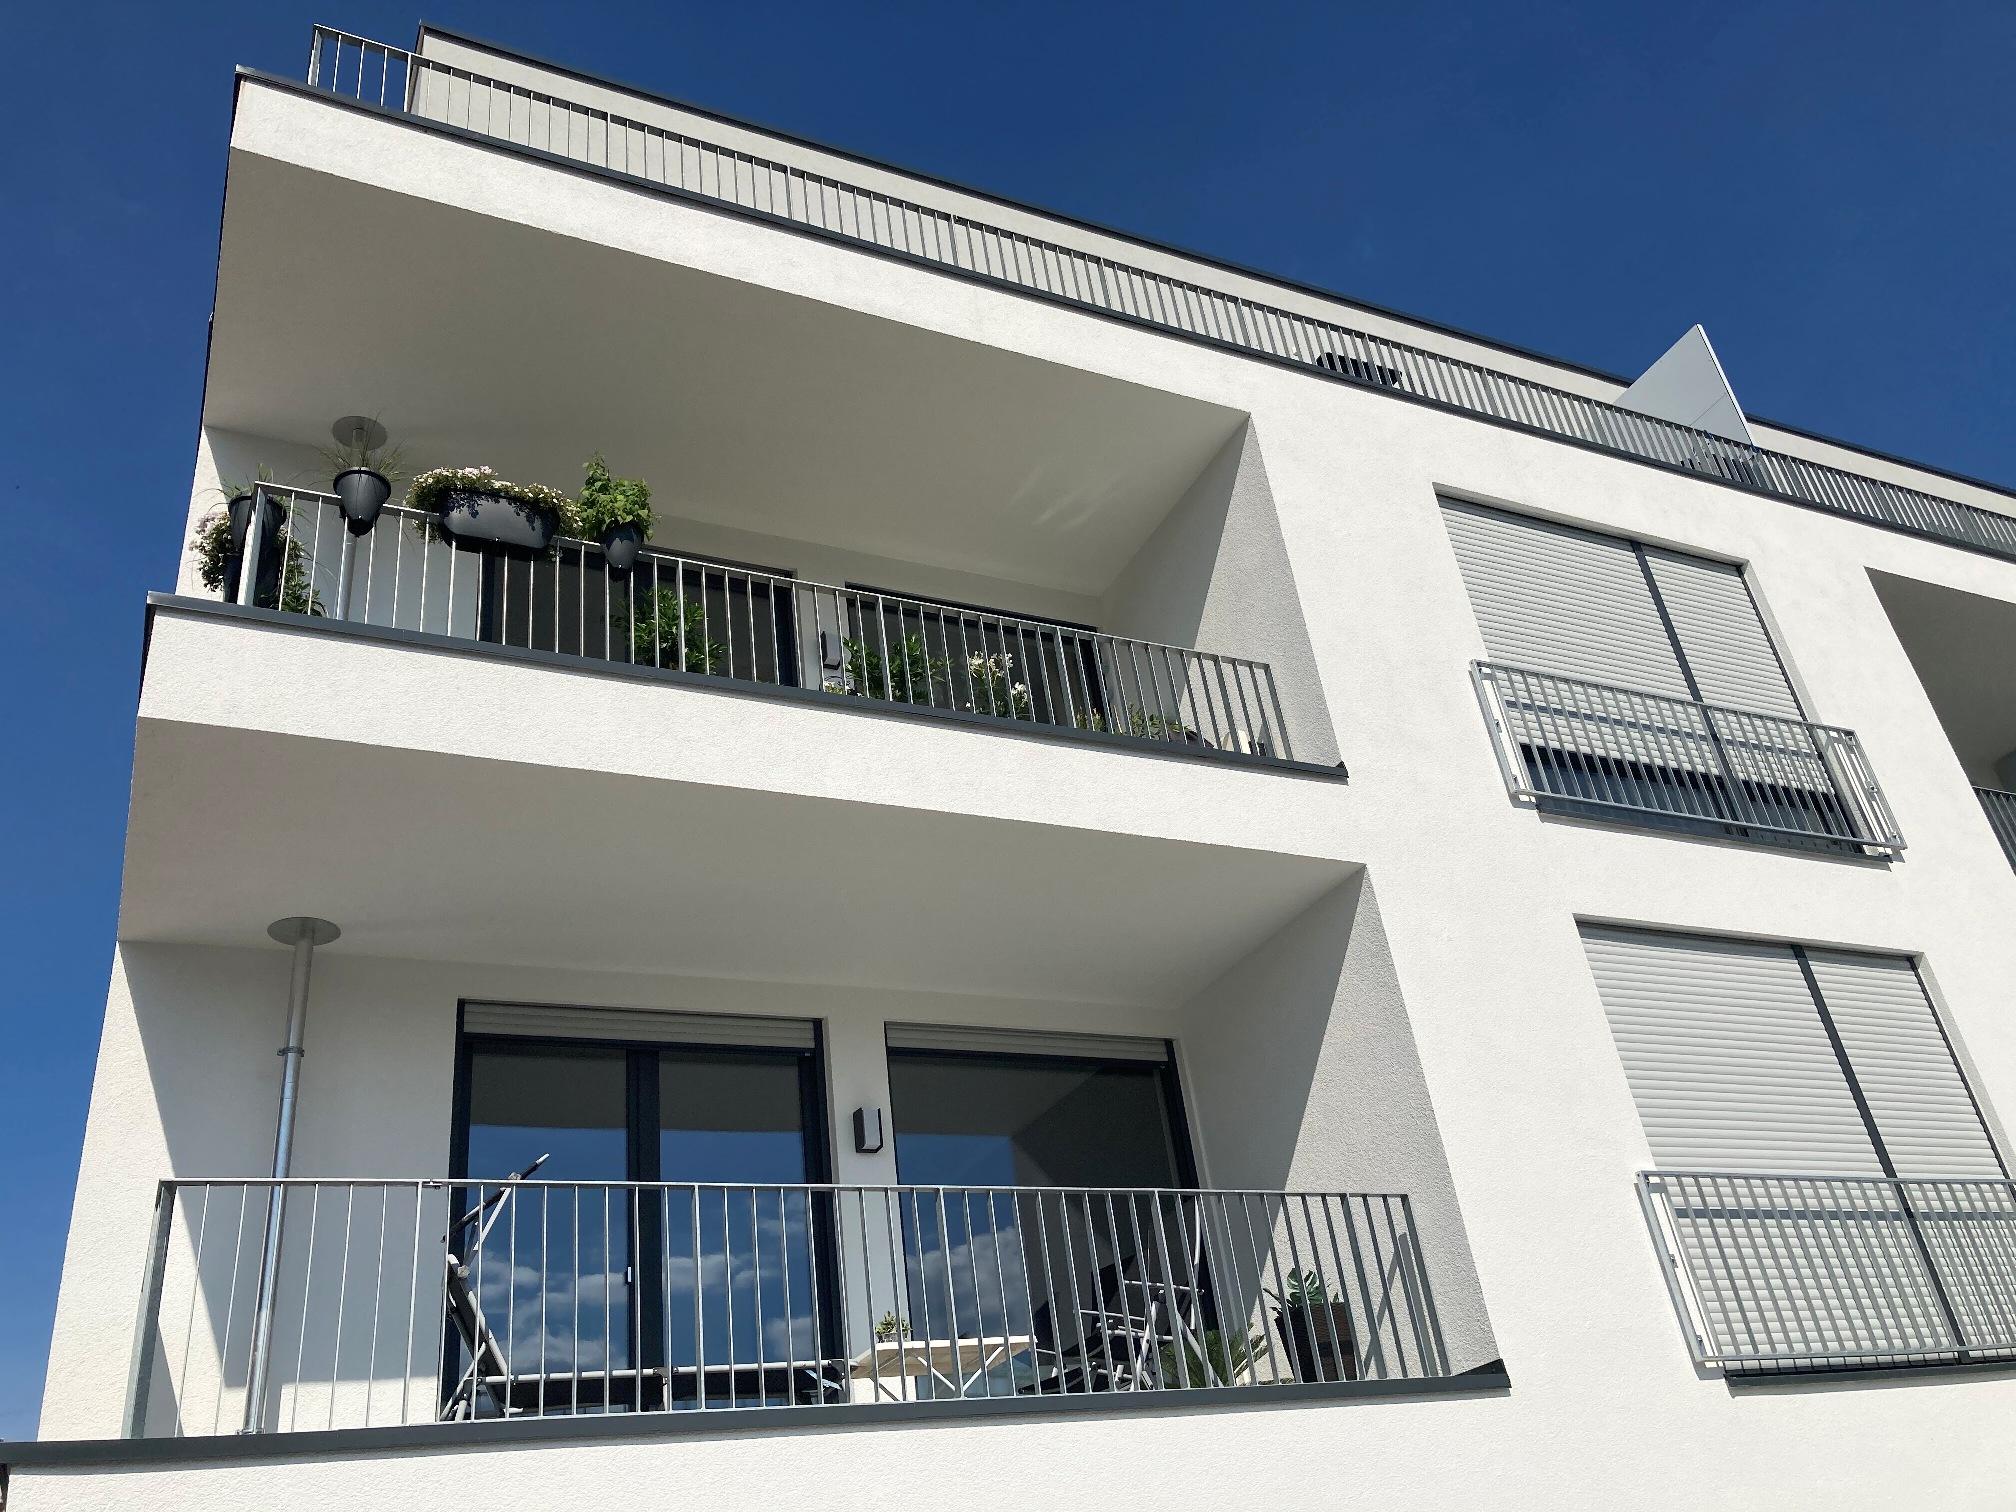 Weitblick Wohnbau Aue, Mehrfamilienhäuser Modern  Mehrfamilienhäuser | Modern